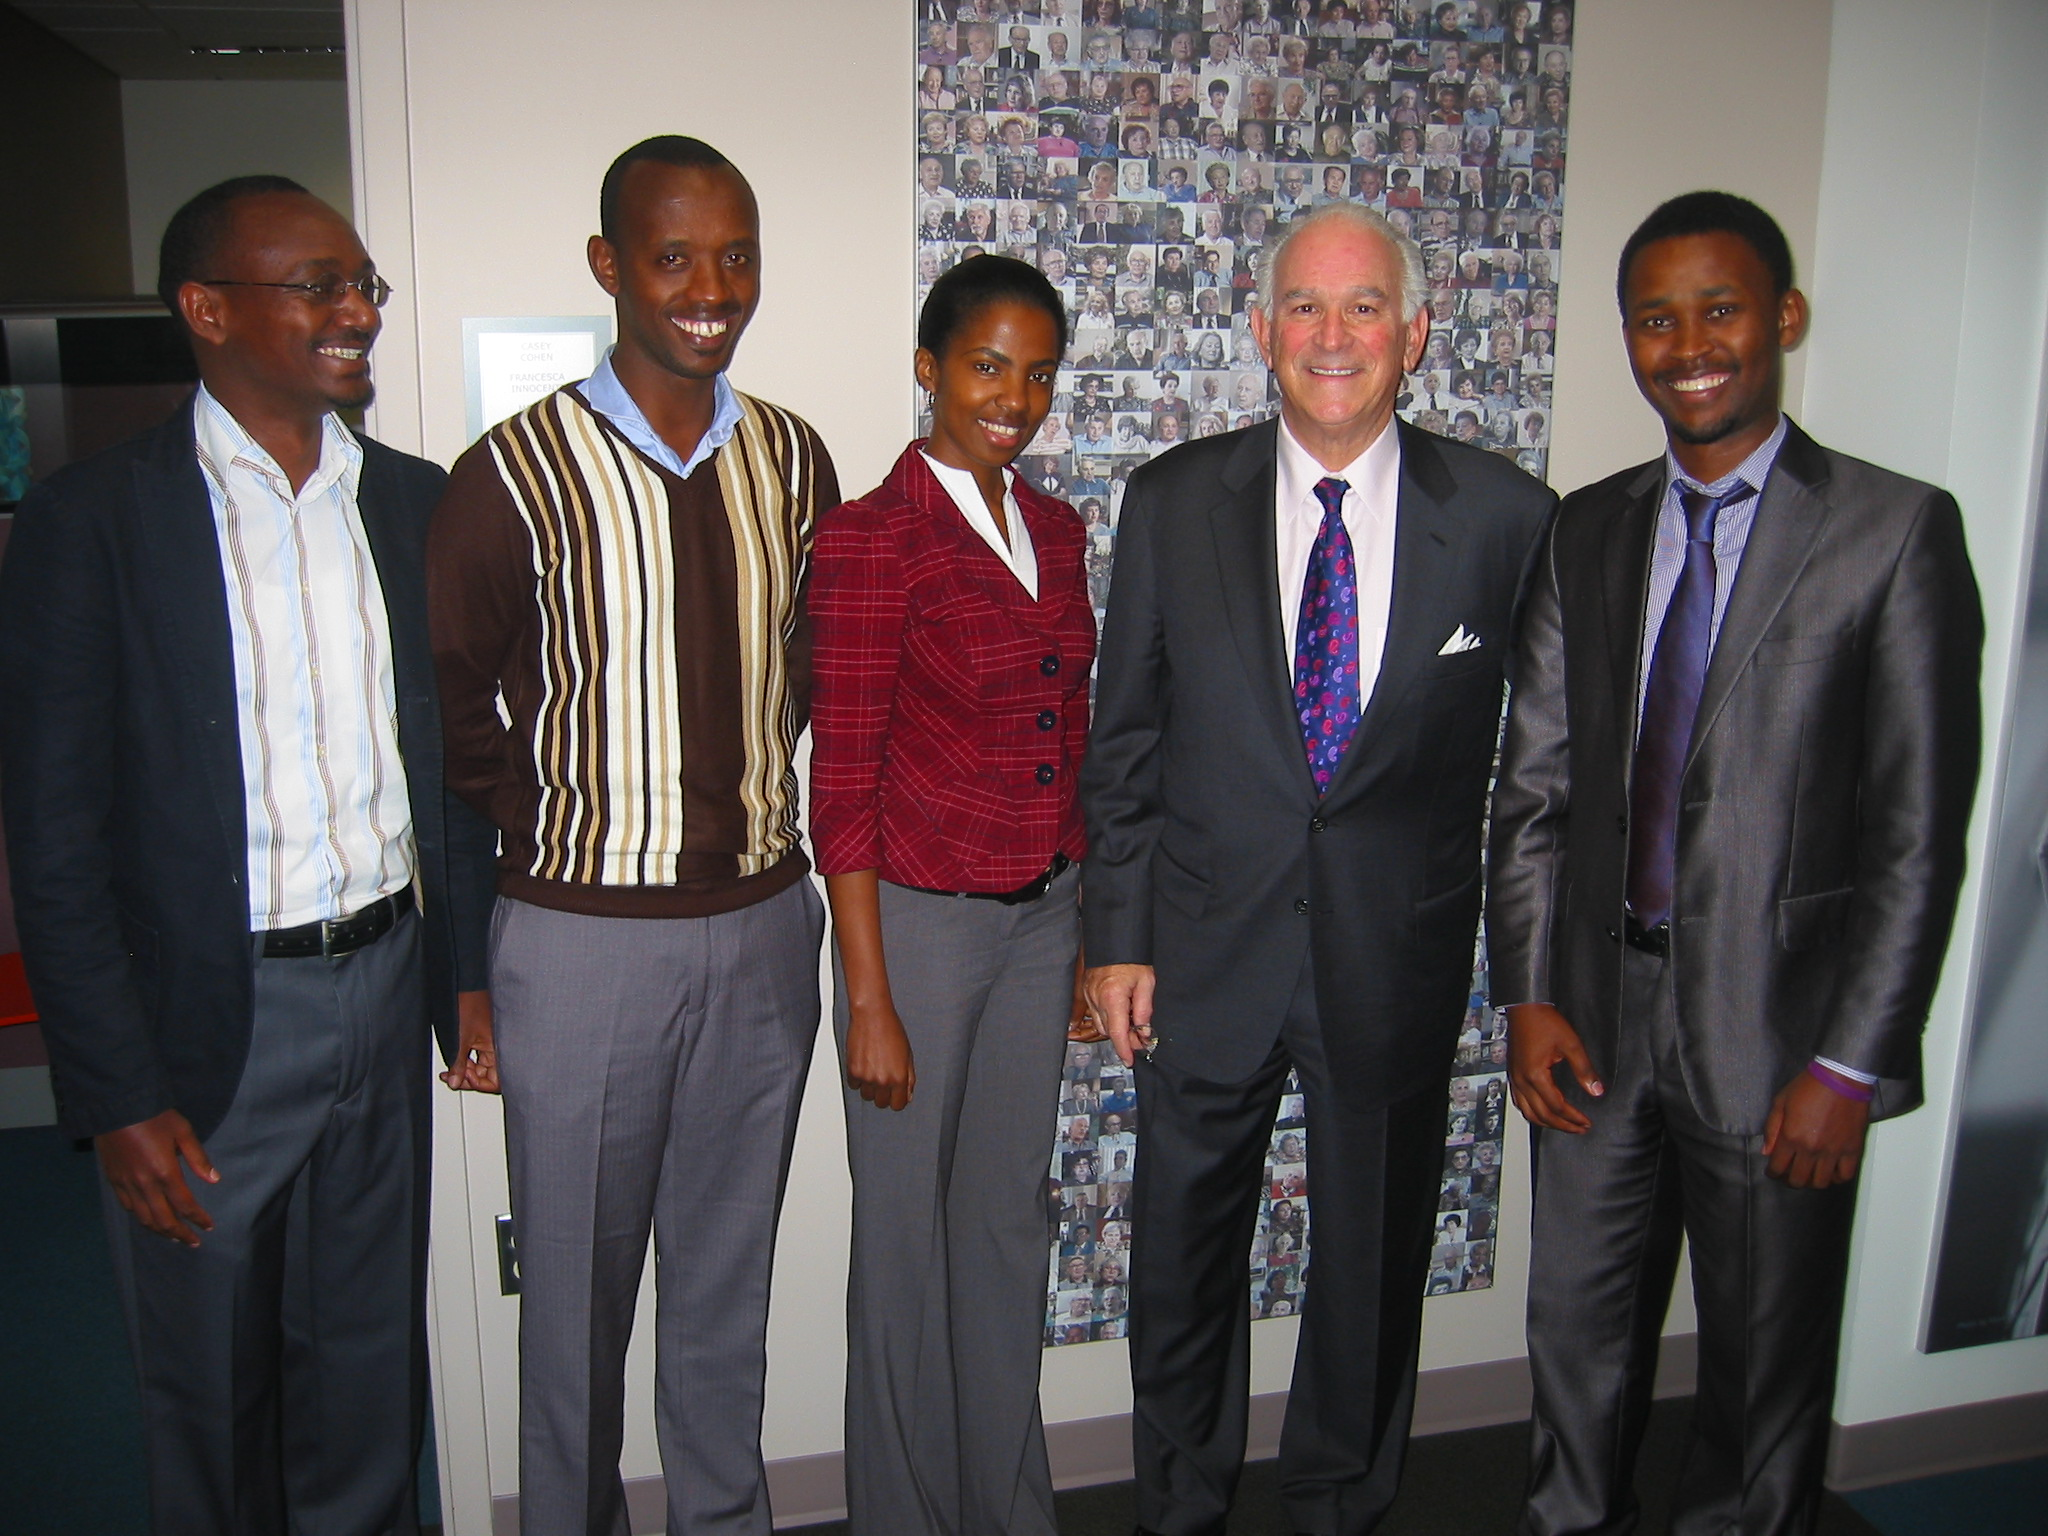 From left:  Paul Rukesha, Martin Niwenshuti, Consolée Uwamariya, Board of Councilors Member Stephen Cozen, and Yves Kamuronsi.